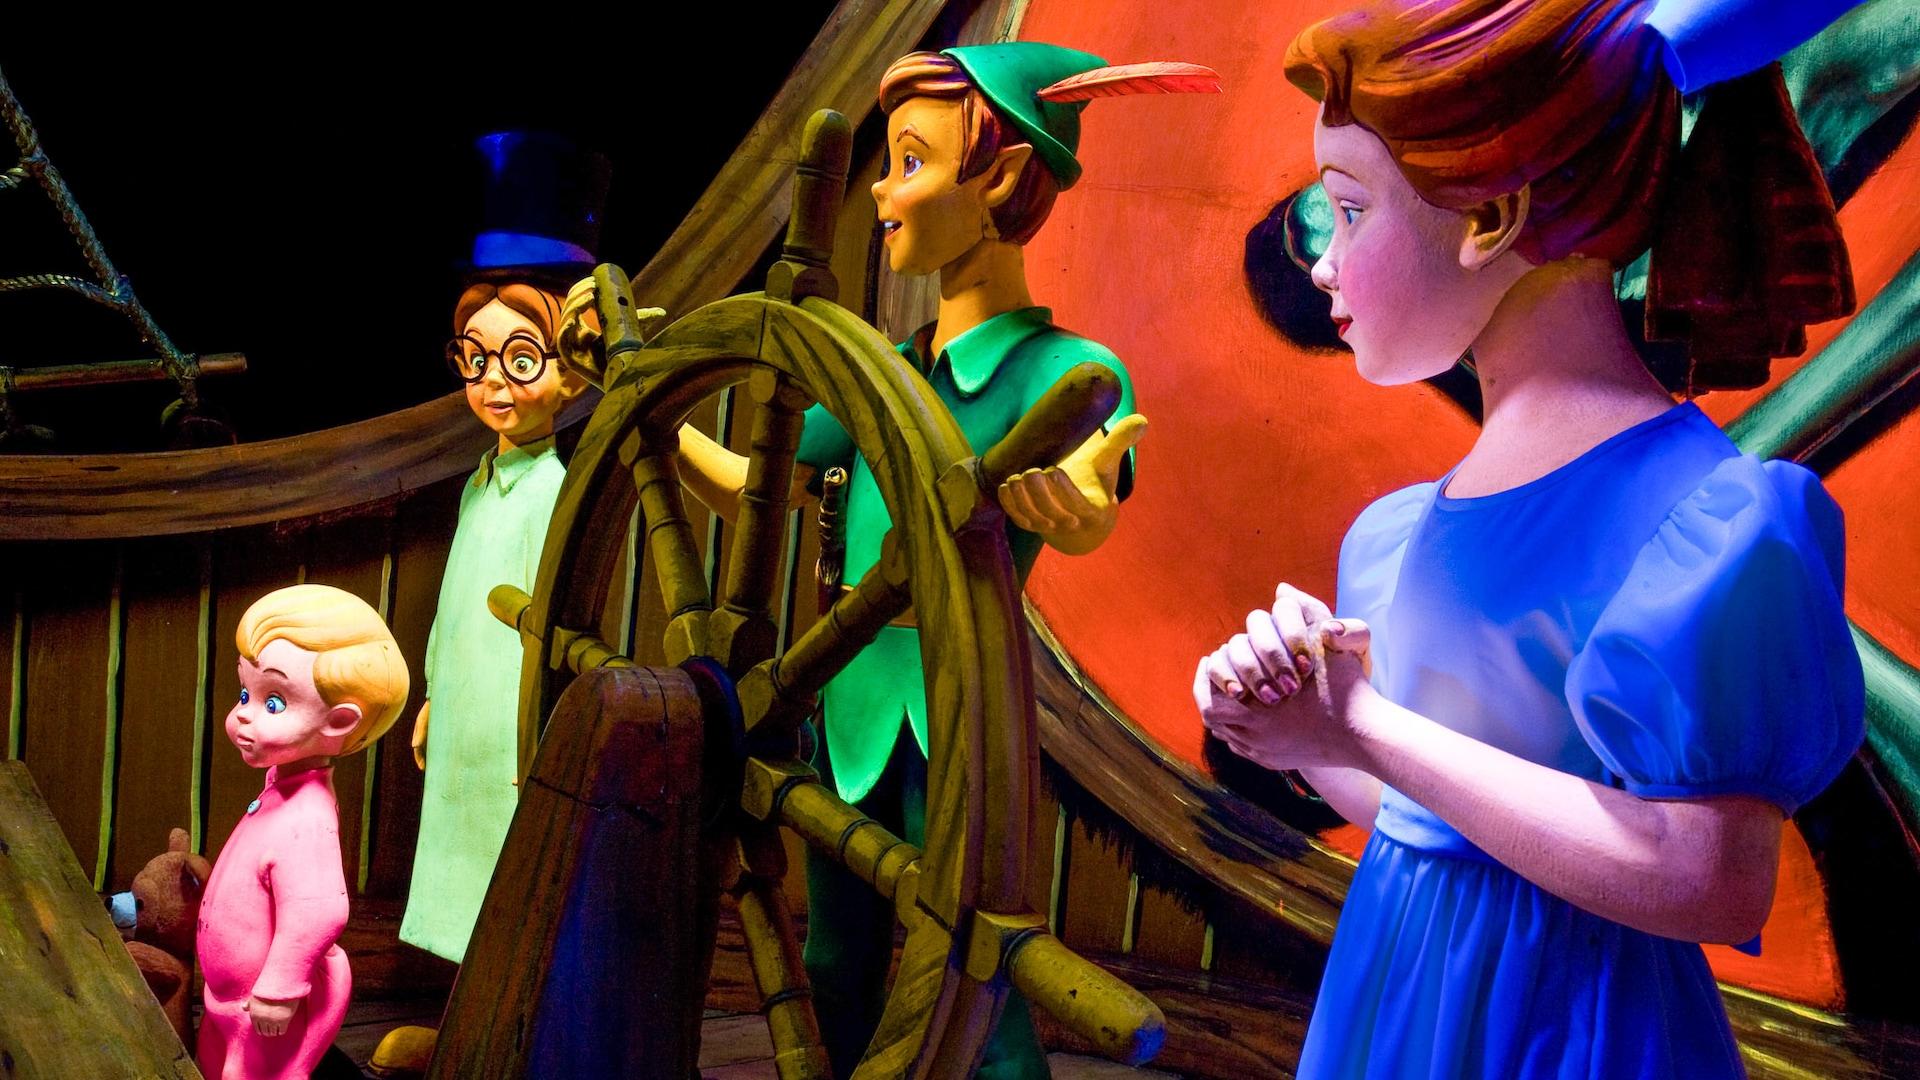 f6650963f6150 Peter Pan s Flight. Attraction located in Fantasyland at Disneyland Park